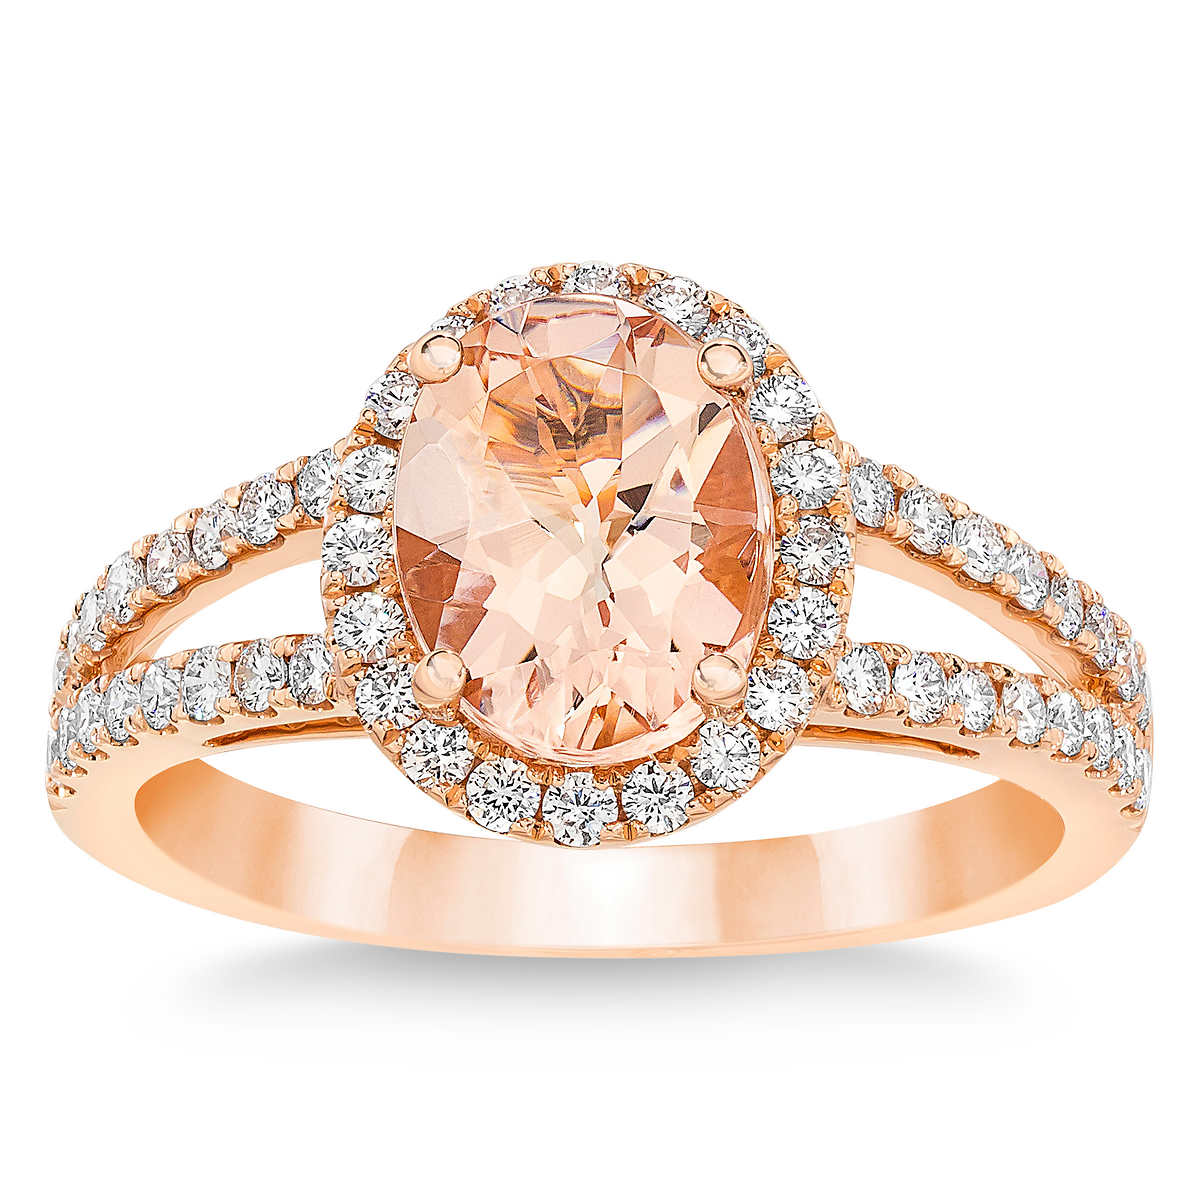 e4e2ebcd21ee0 Morganite and Diamond 14kt Rose Gold Ring